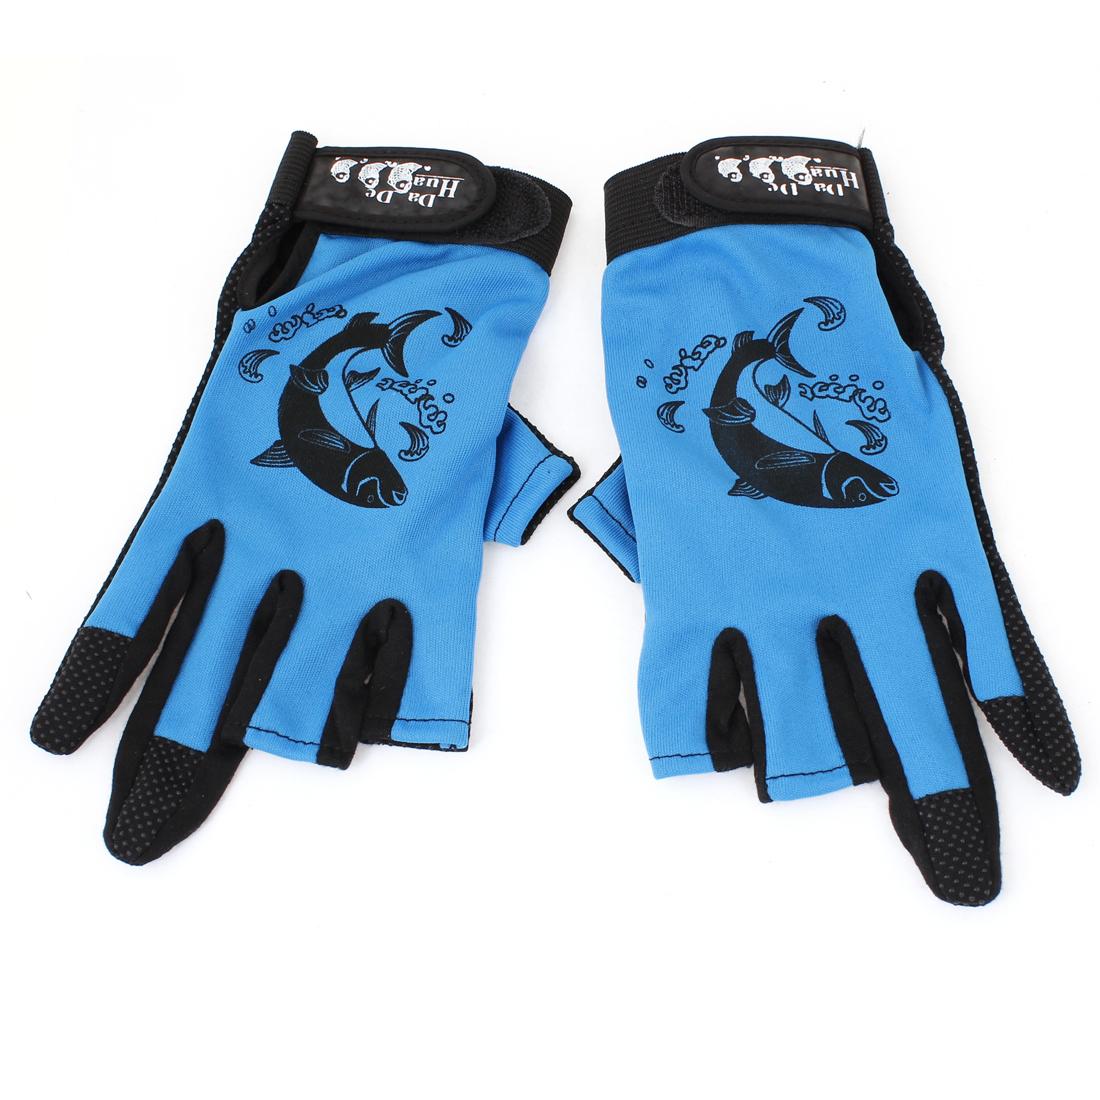 Antilip 3 Fingerless Hook Loop Closure Fishing Sports Gloves Blue Black 2 Pcs